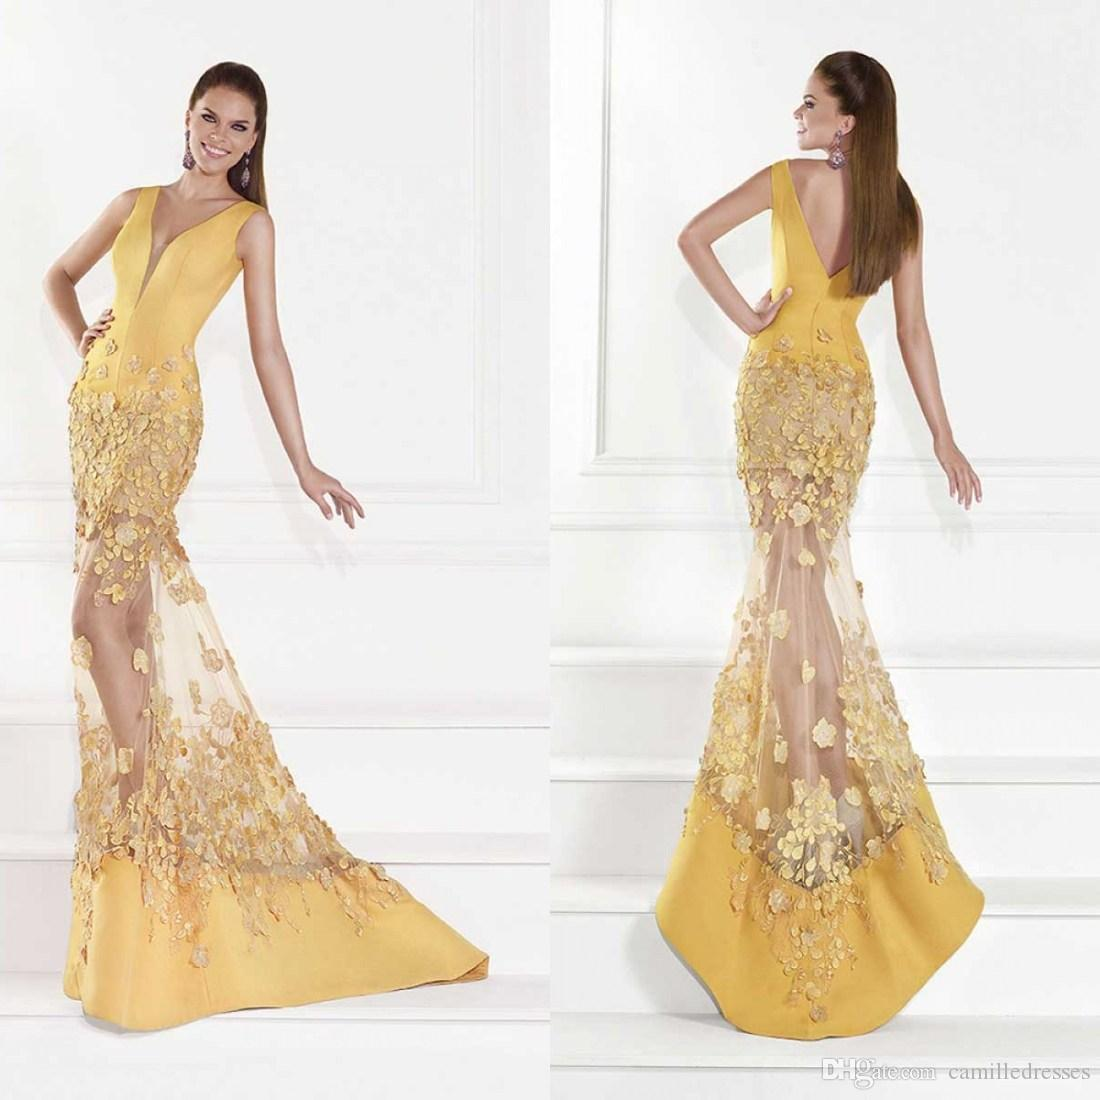 Dhgates Wedding Dresses 75 Epic